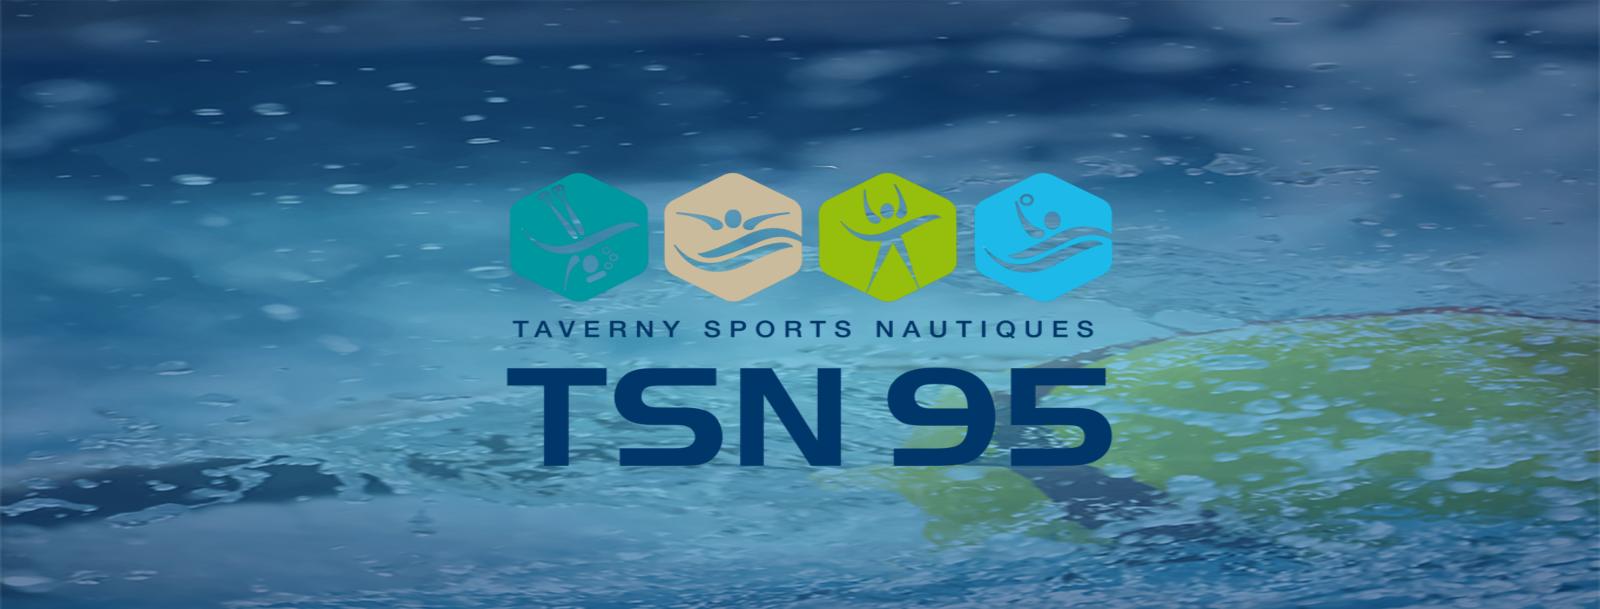 Taverny Sports Nautiques 95